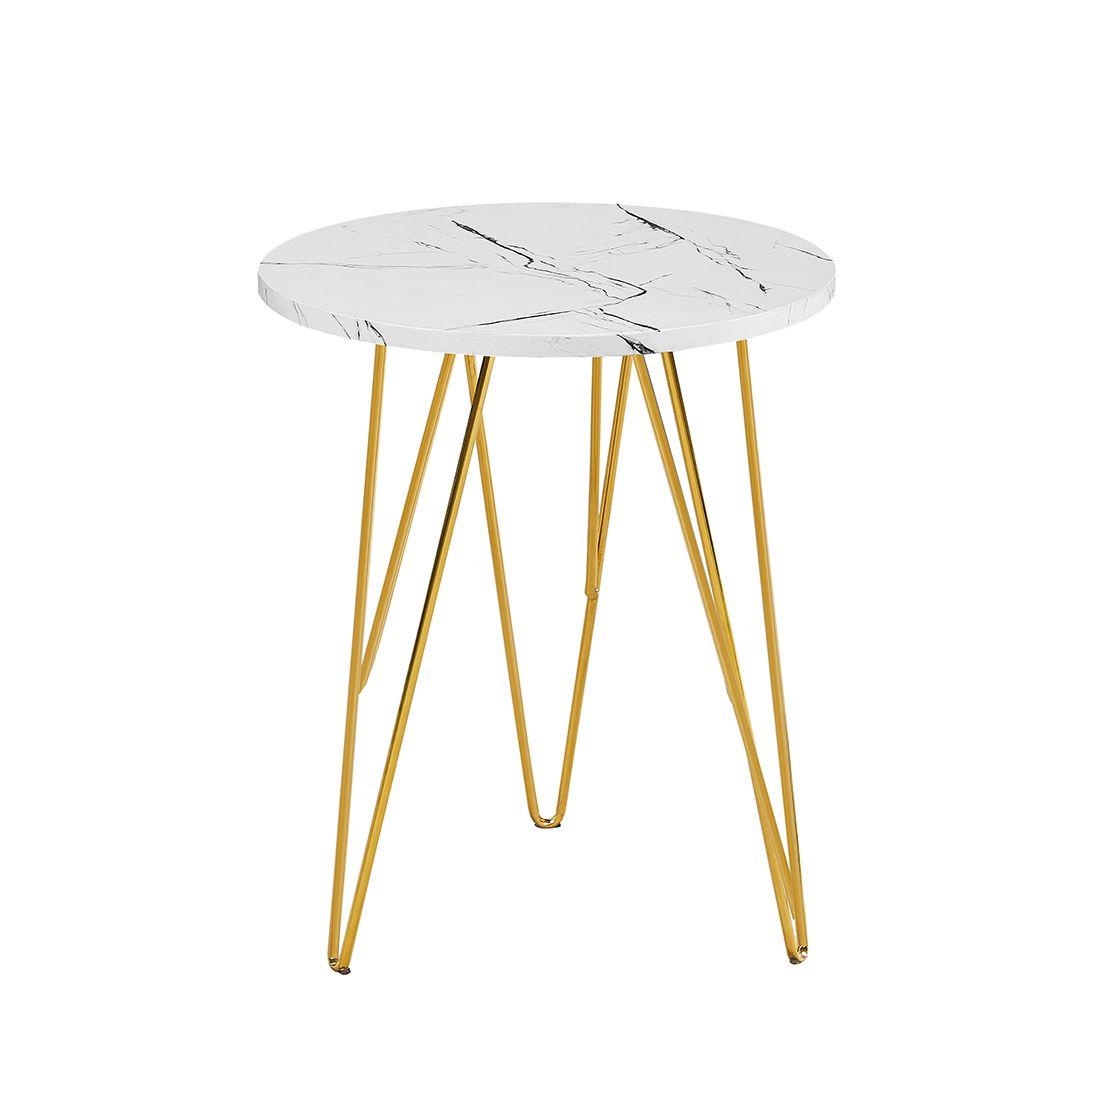 Fushion Lamp Table Marble White